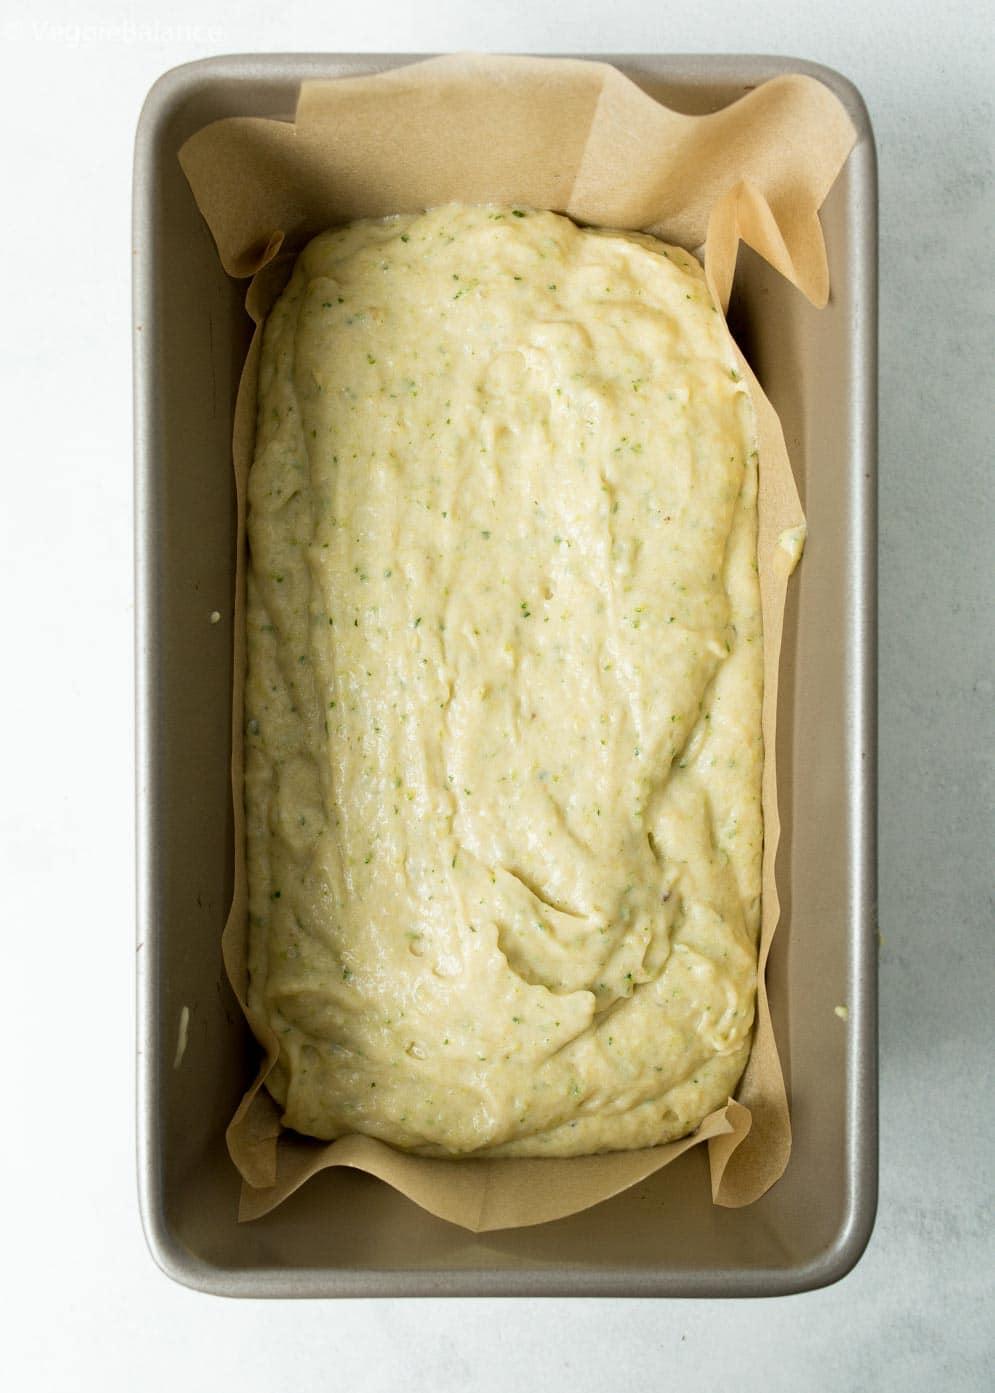 Vegan Gluten-Free Zucchini Bread Loaf Before Baking